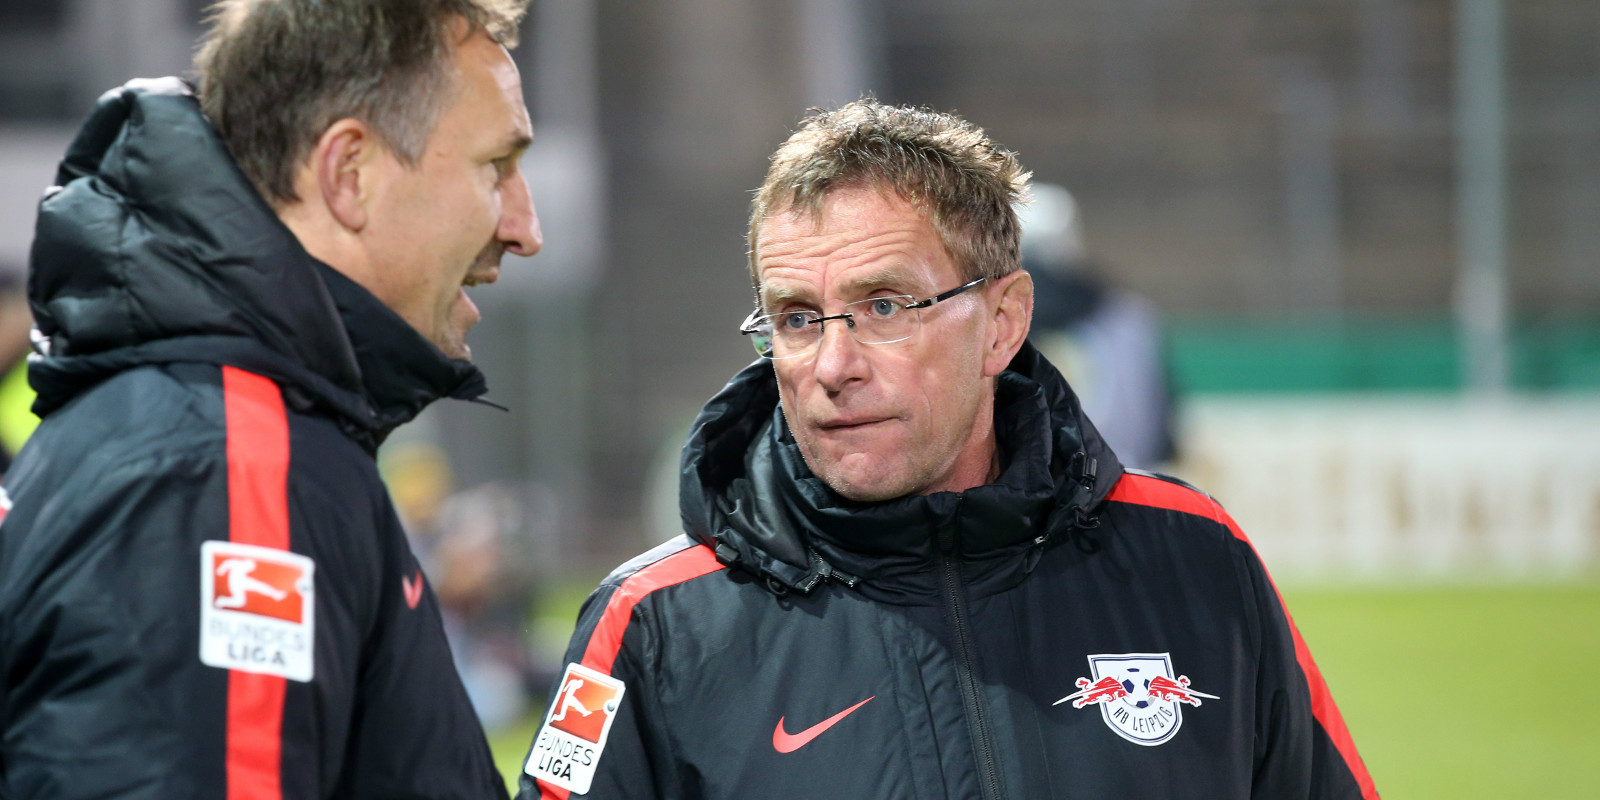 2. Runde DFB-Pokal: SpVgg Unterhaching – RB Leipzig 3:0